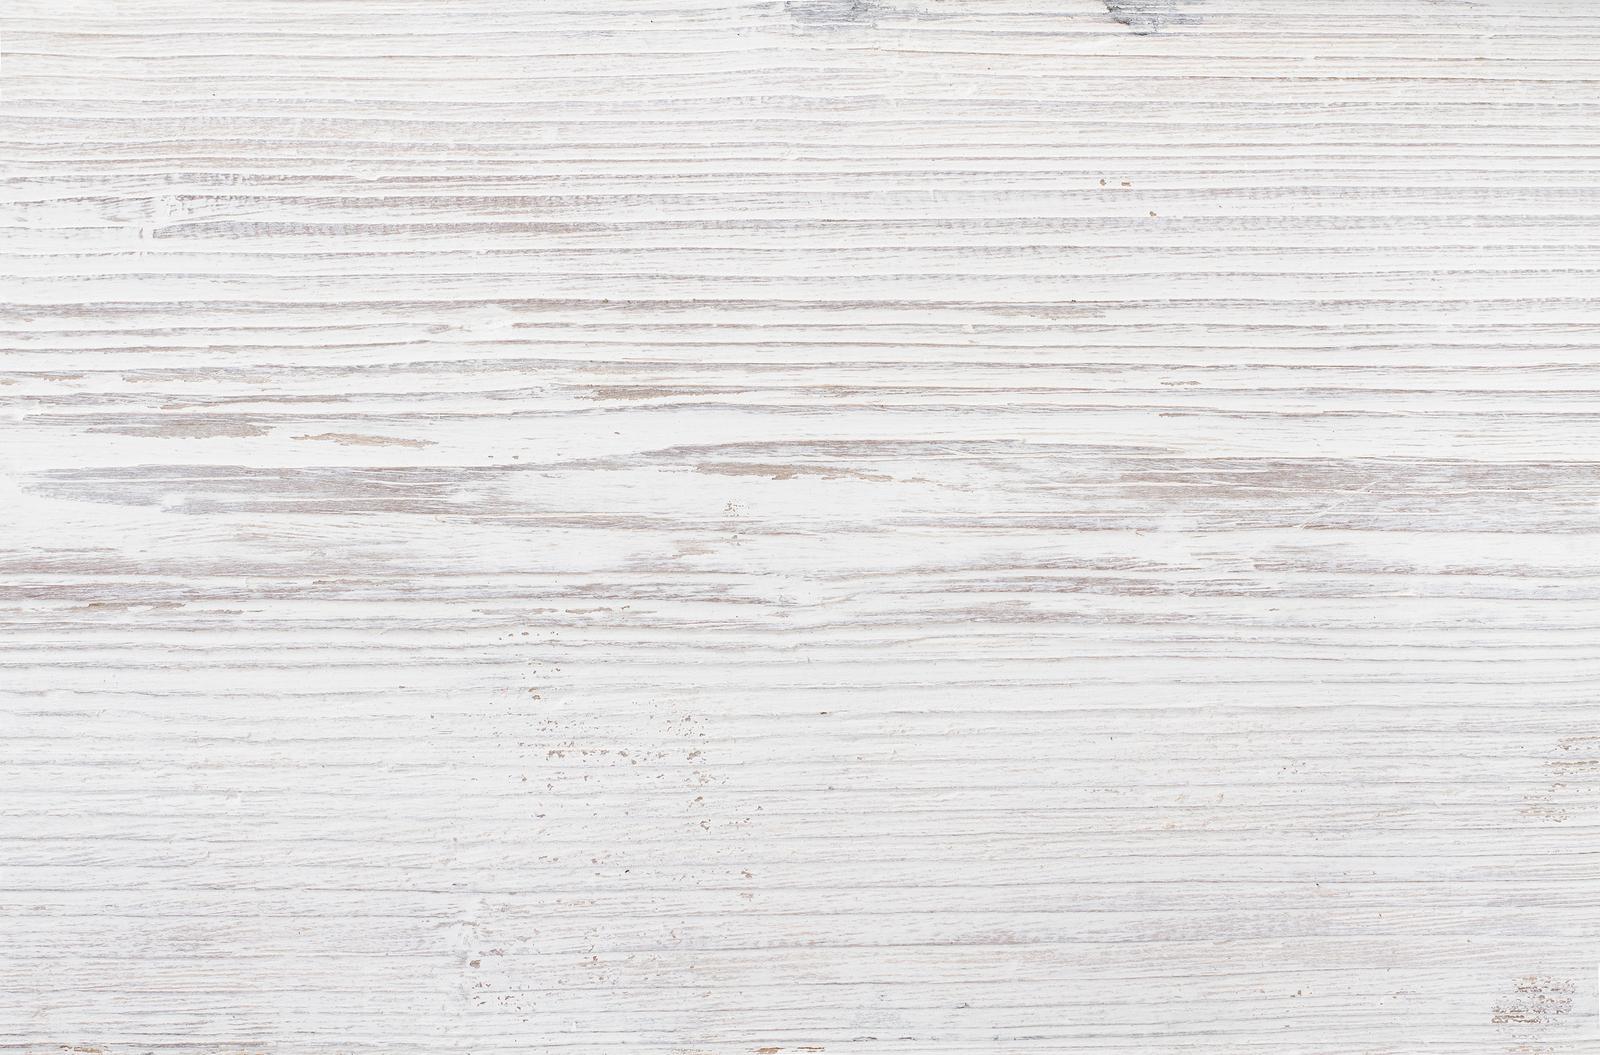 white-wood-floor-texture-white-wood-texture—en-yeniler-en